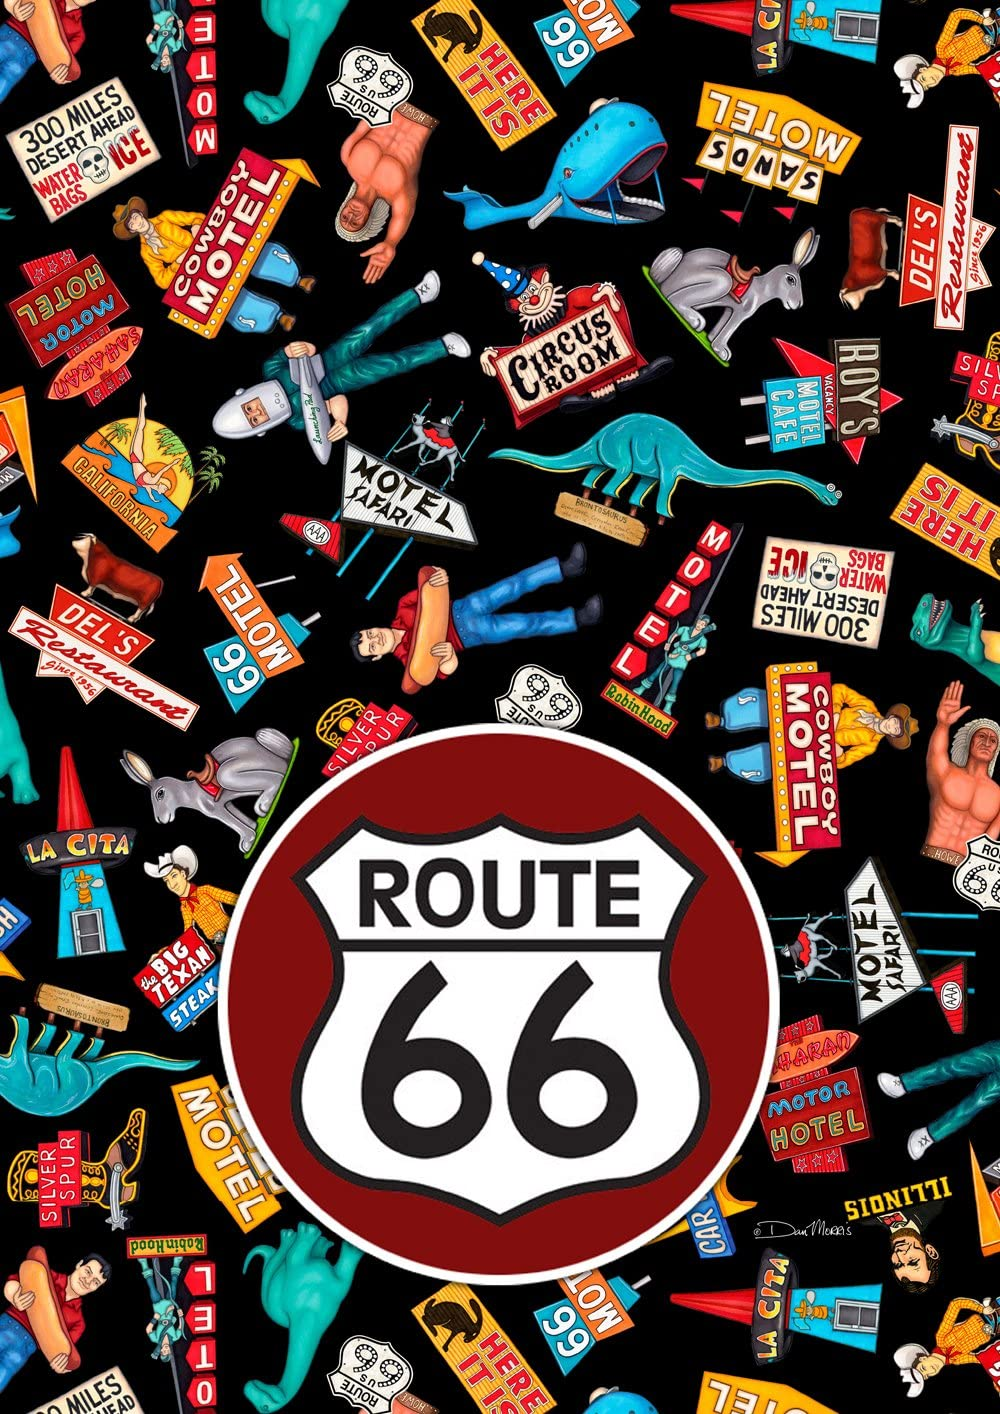 Toland Home Garden Kicks On 66 12.5 x 18 Inch Decorative Vintage Highway Route Motel Car Garden Flag